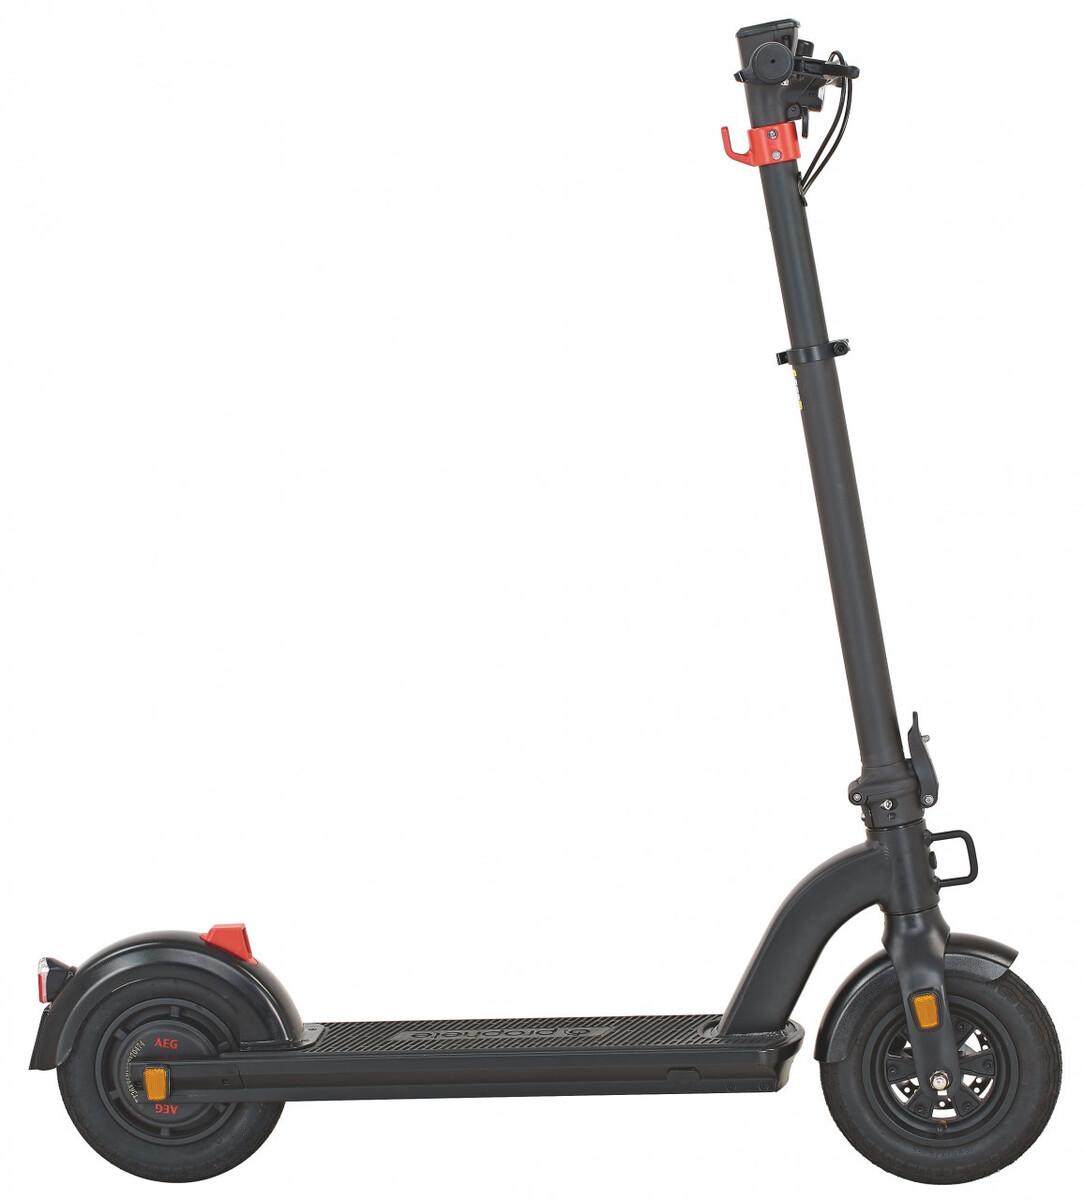 "Bild 1 von Prophete E-Scooter 10"" AEG DirectDrive"